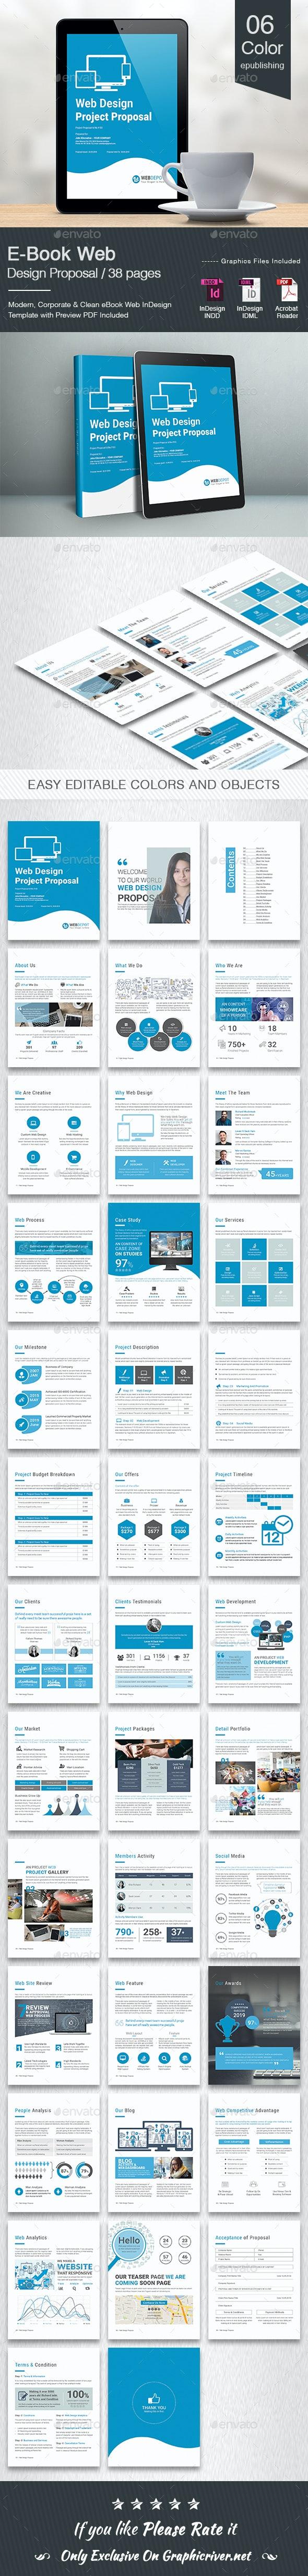 E-Book Web Design Proposal - Digital Books ePublishing